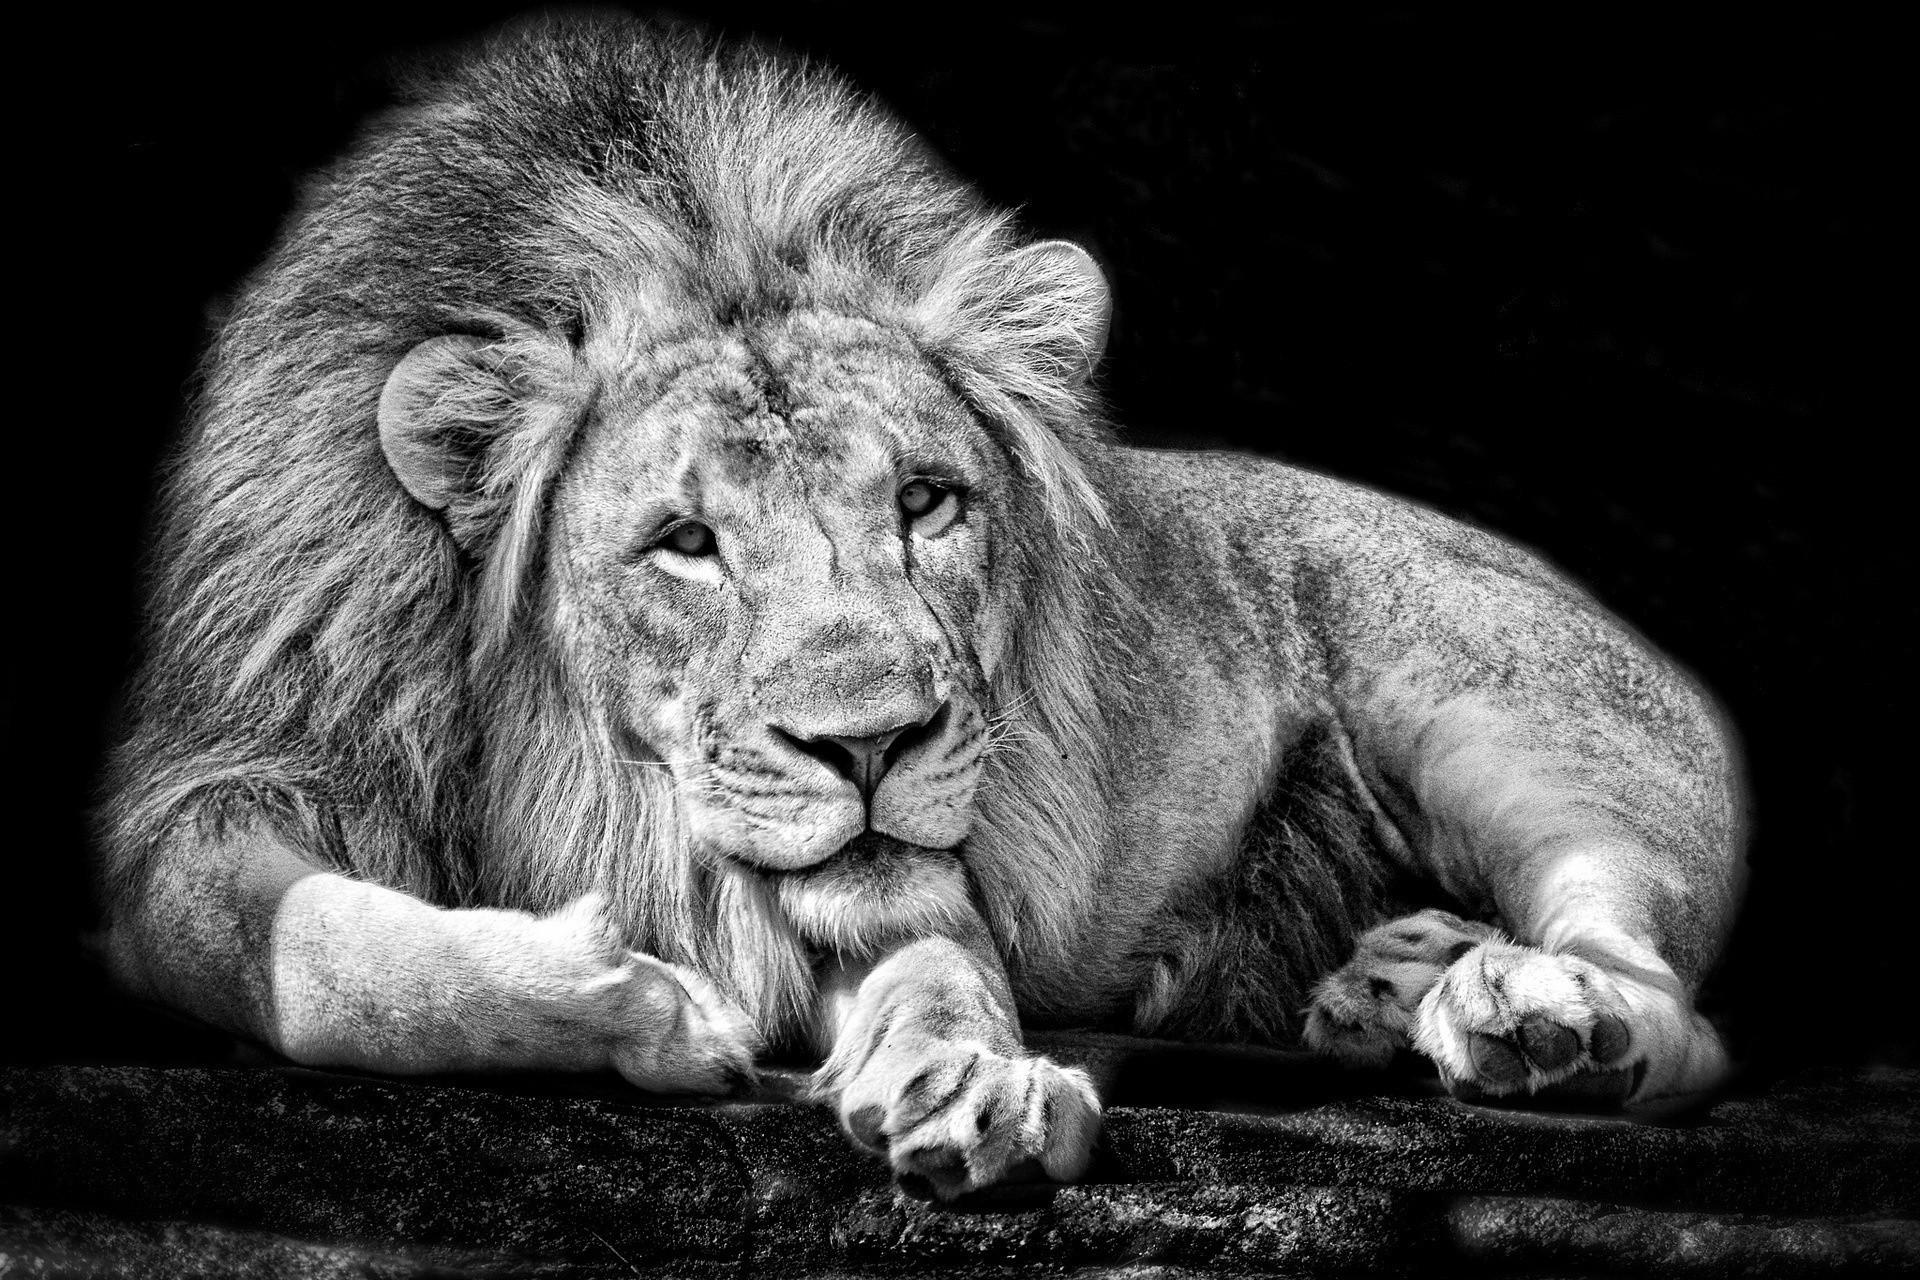 Monochrome Animals Lions Black White